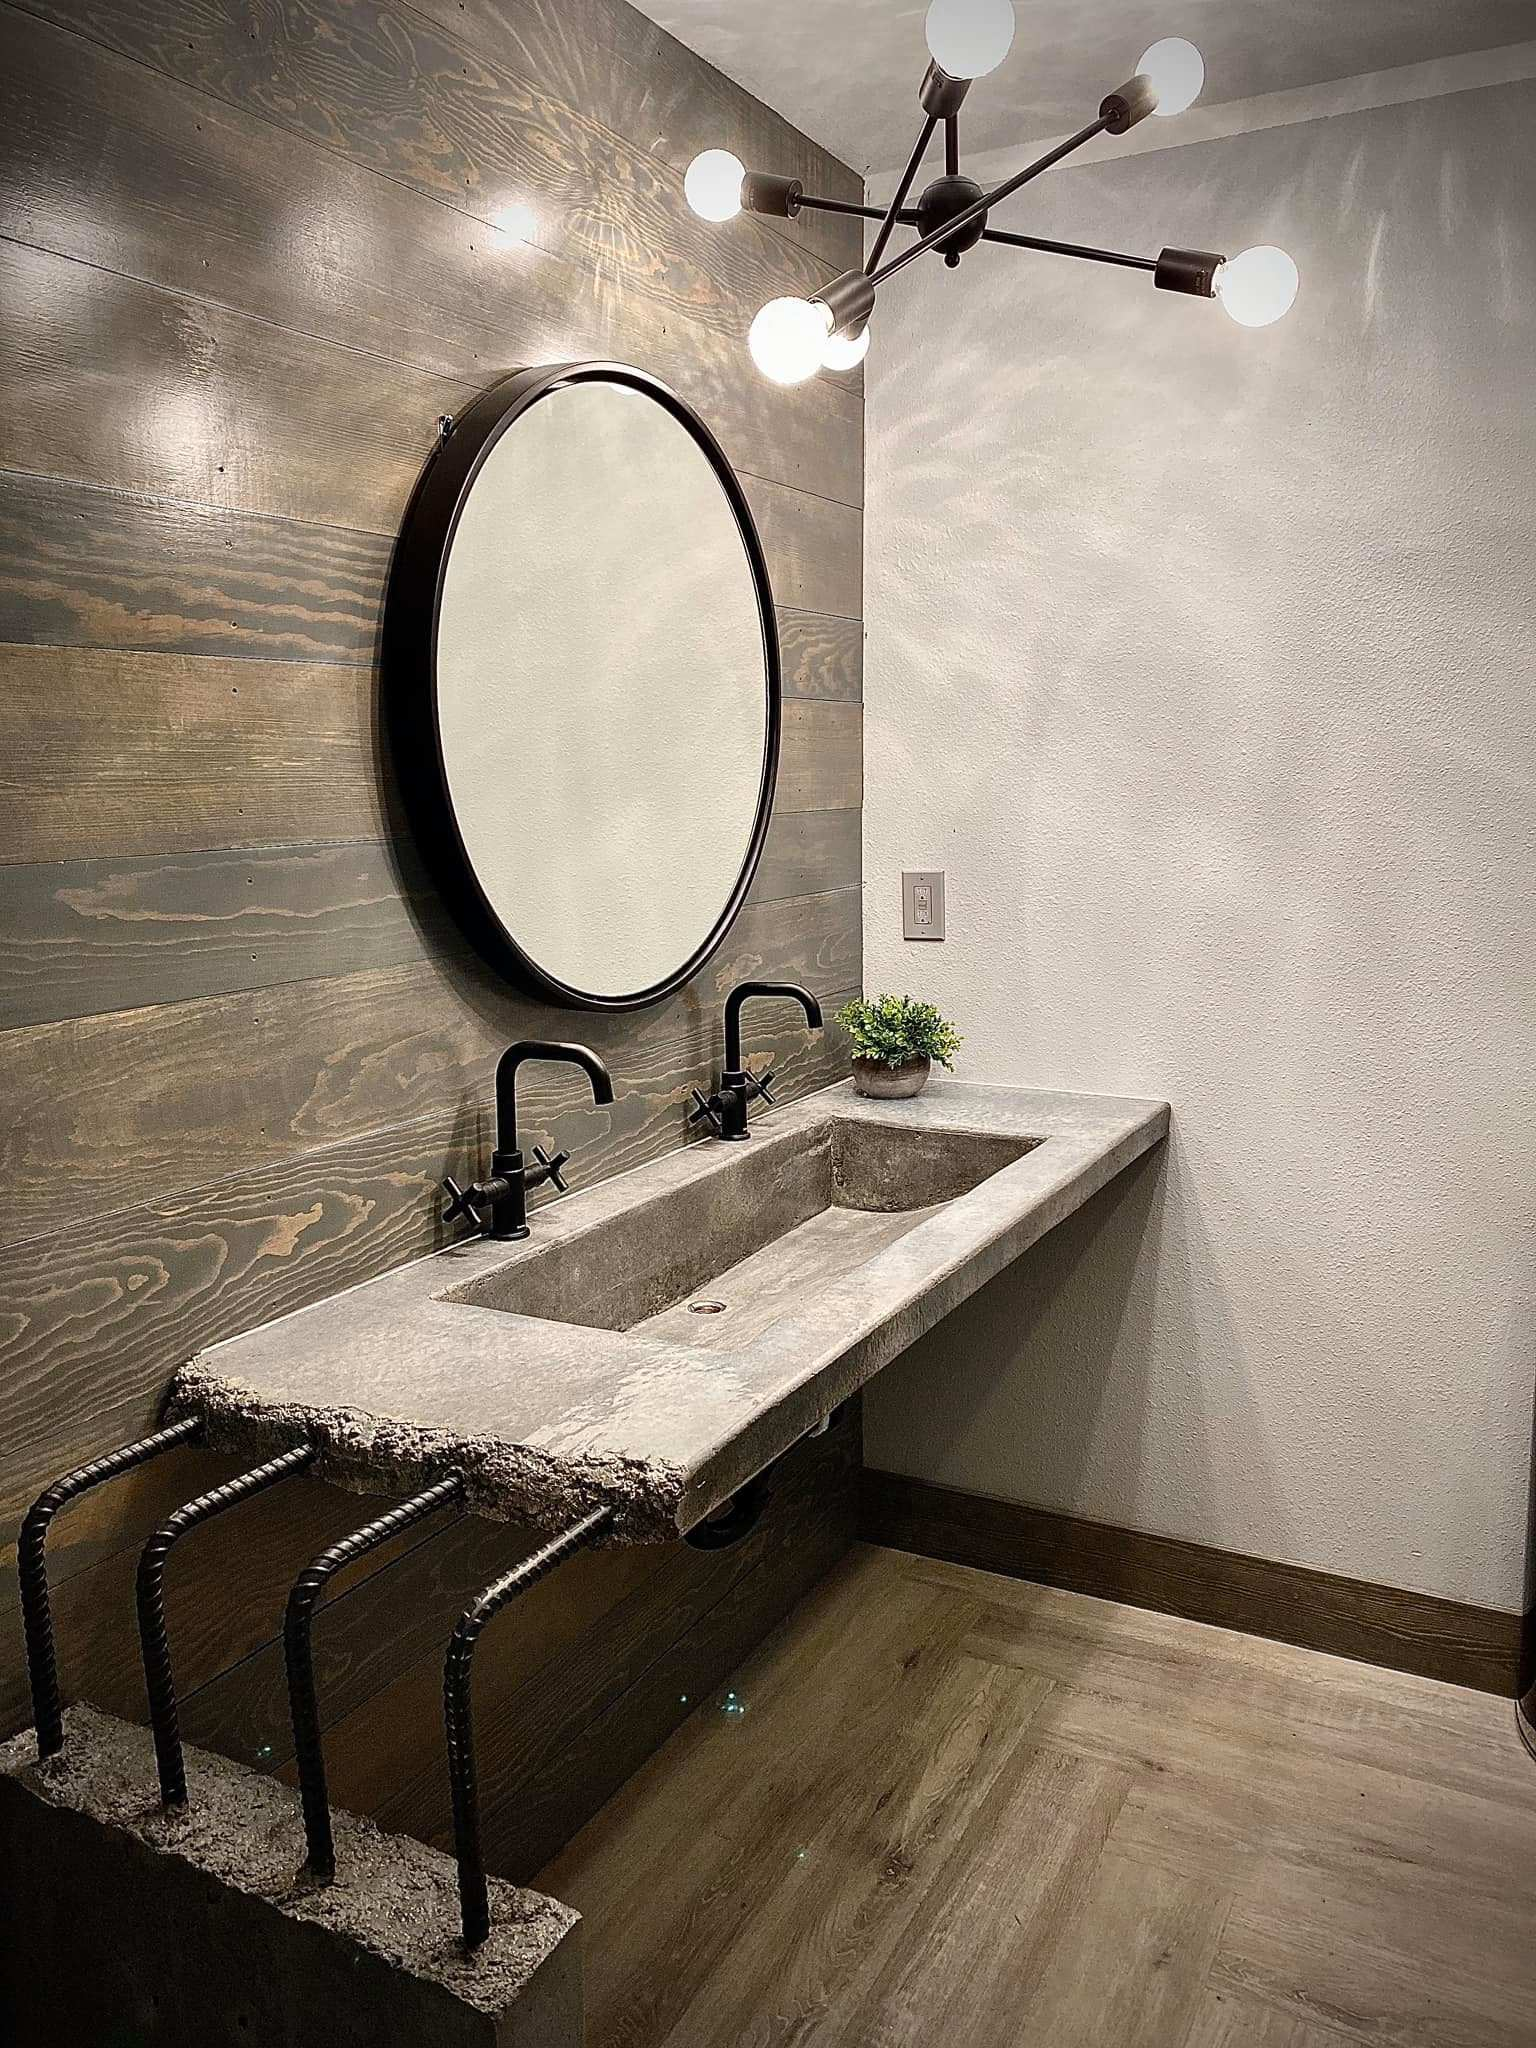 06-Customize-the-Vanity-Industrial-Bathr